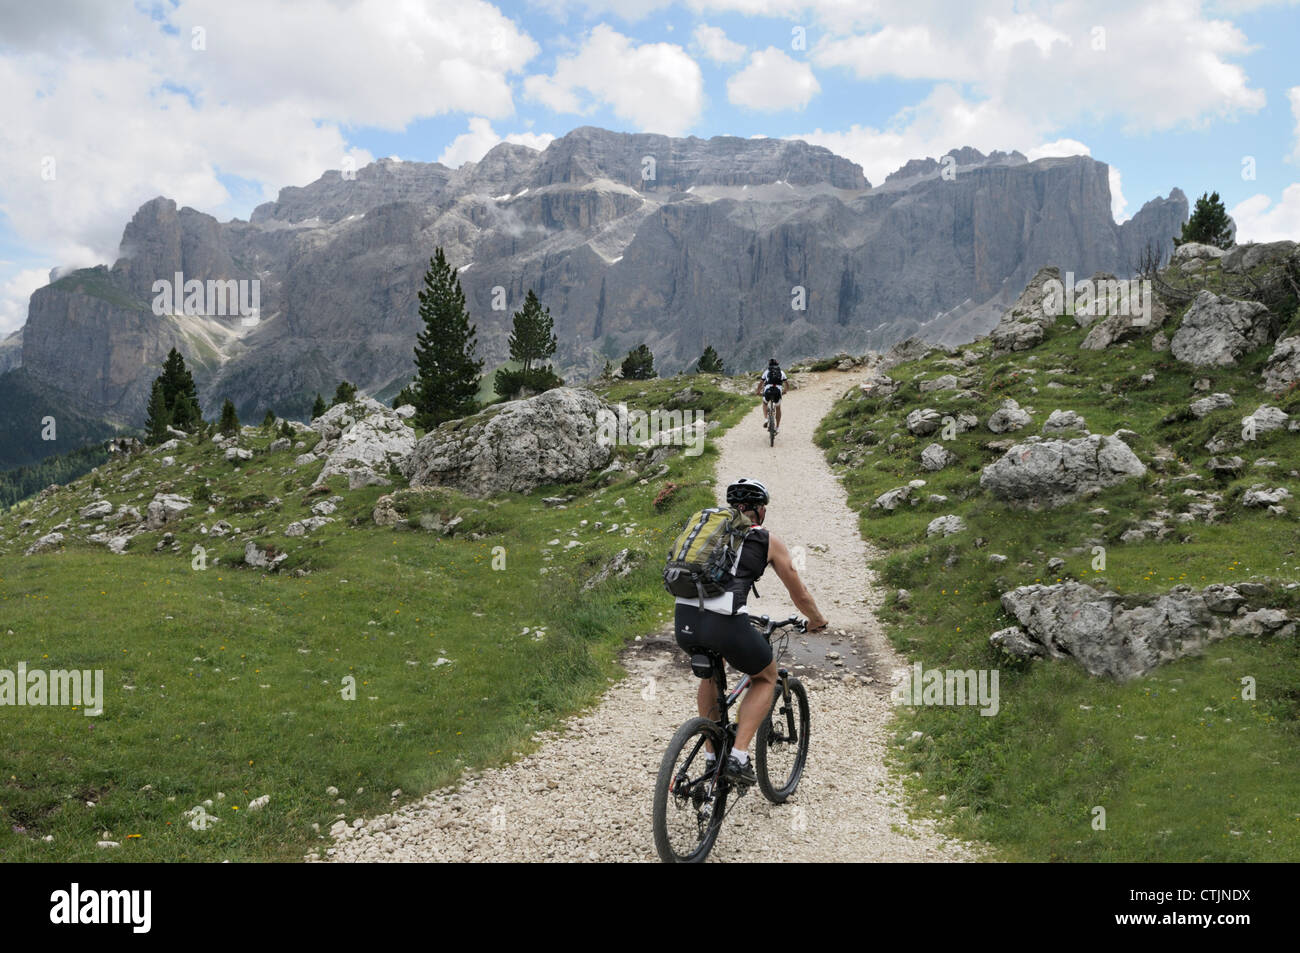 Mountain biking towards the Sella Massif in the Dolomites near Sella Pass - Stock Image